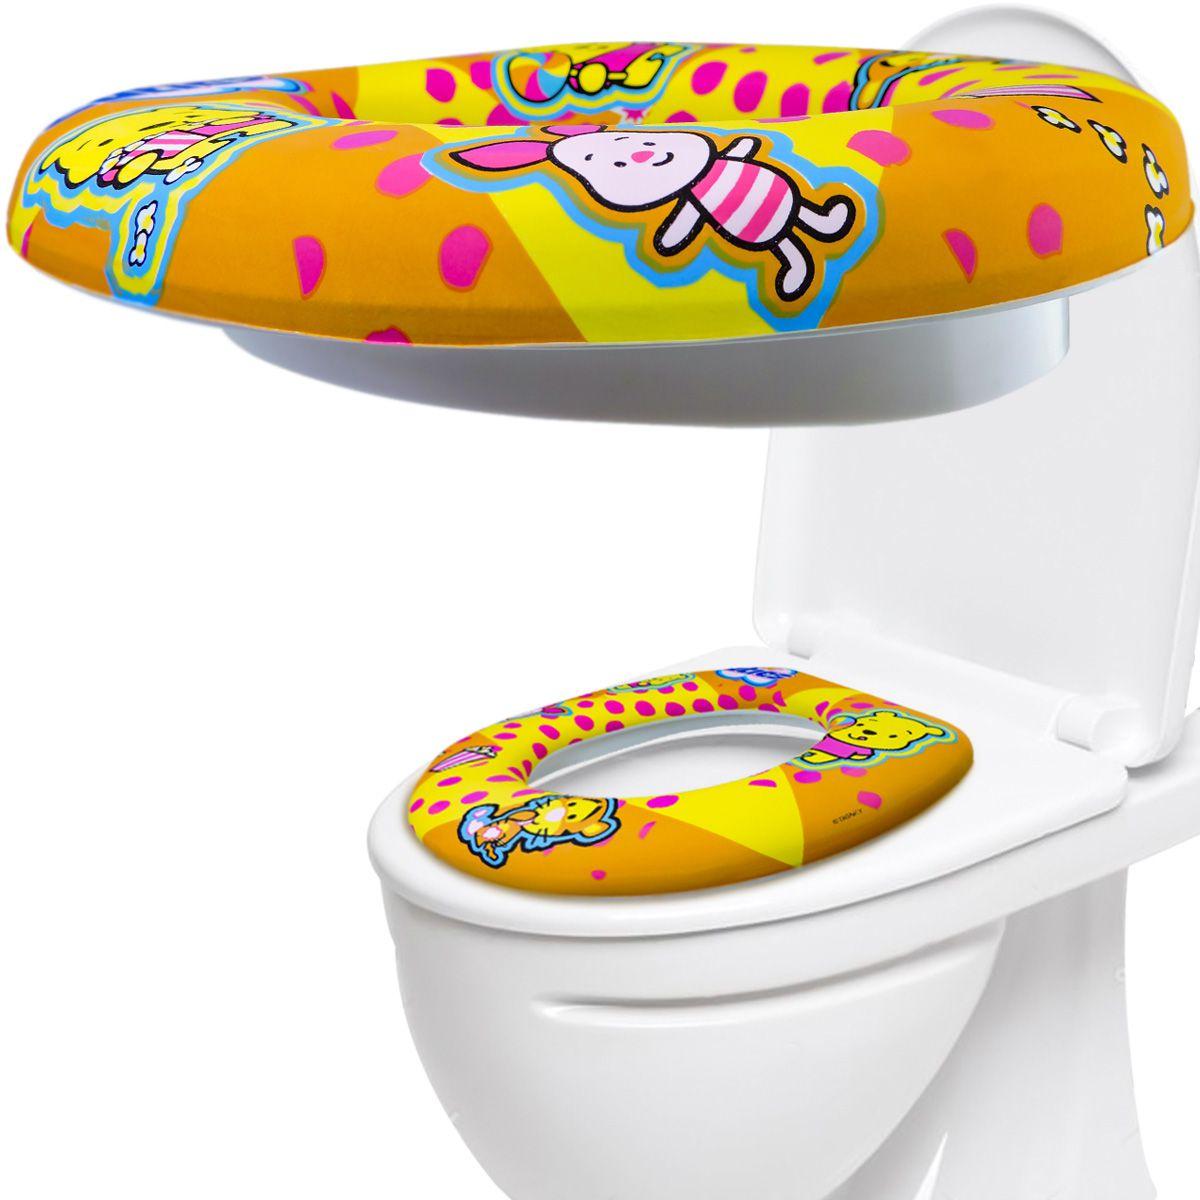 Assento Redutor Acolchoado Infantil Para Vaso Sanitário Disney Baby